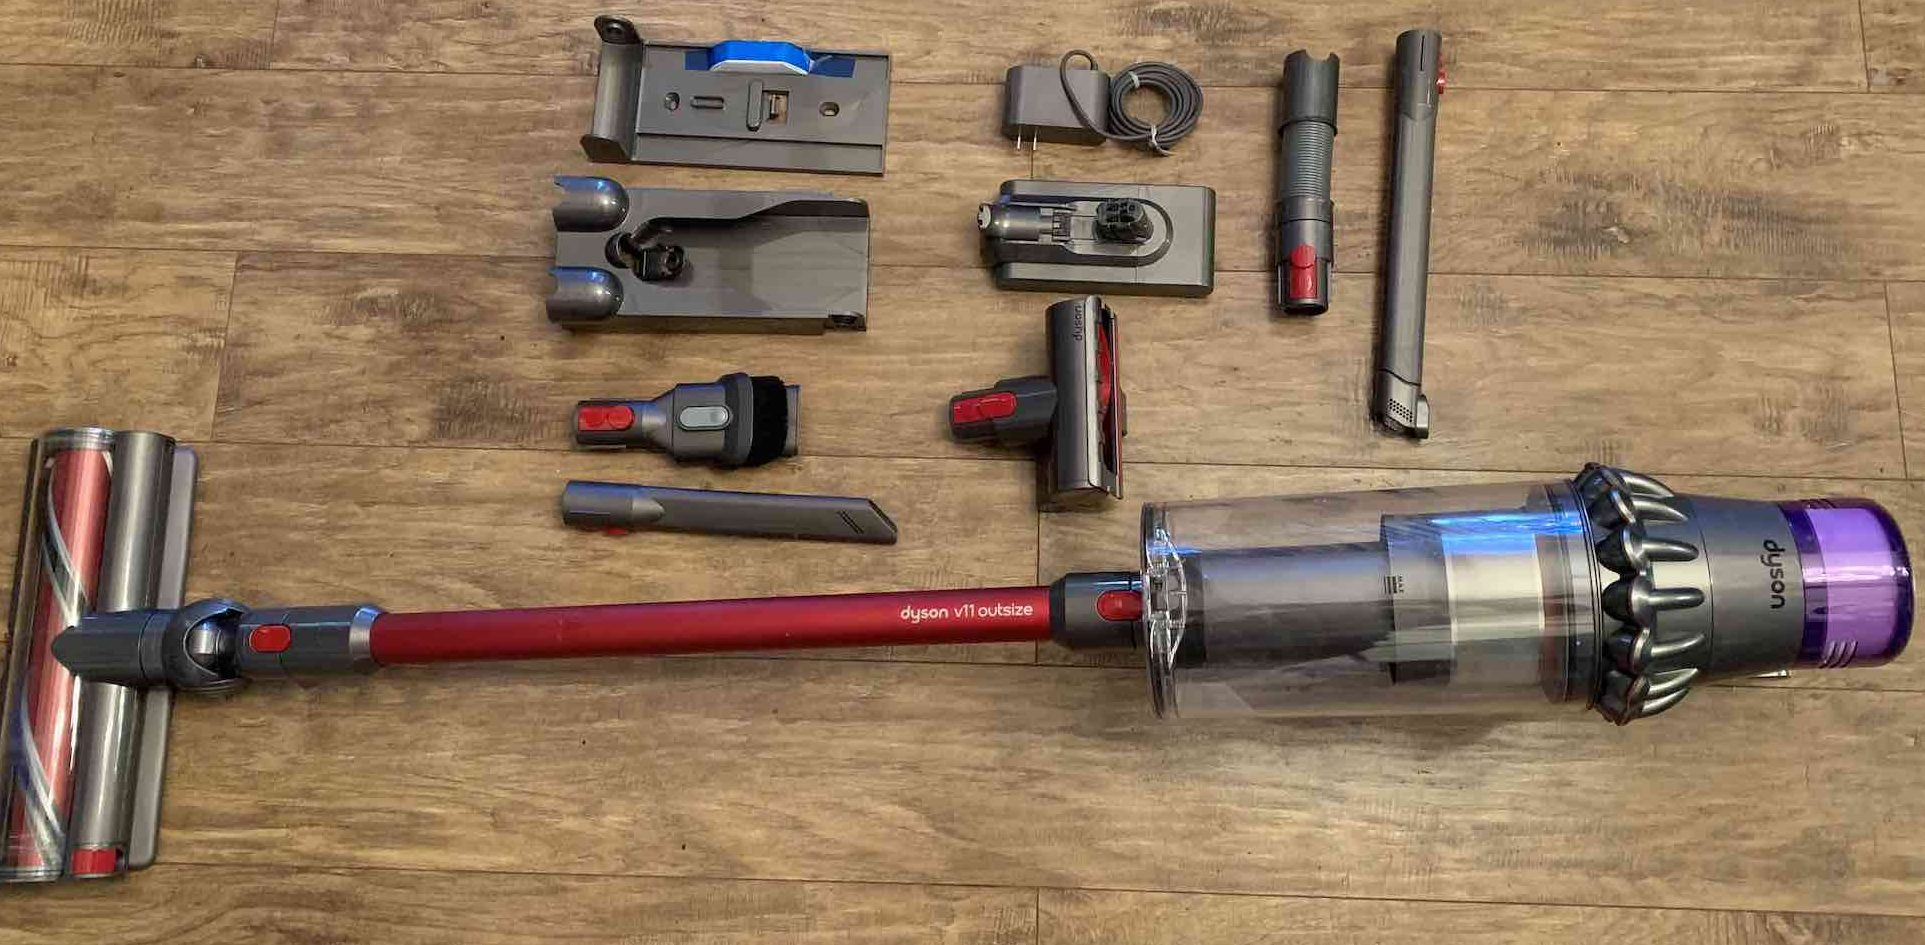 Dyson V11 Outsize Stick vacuum Review